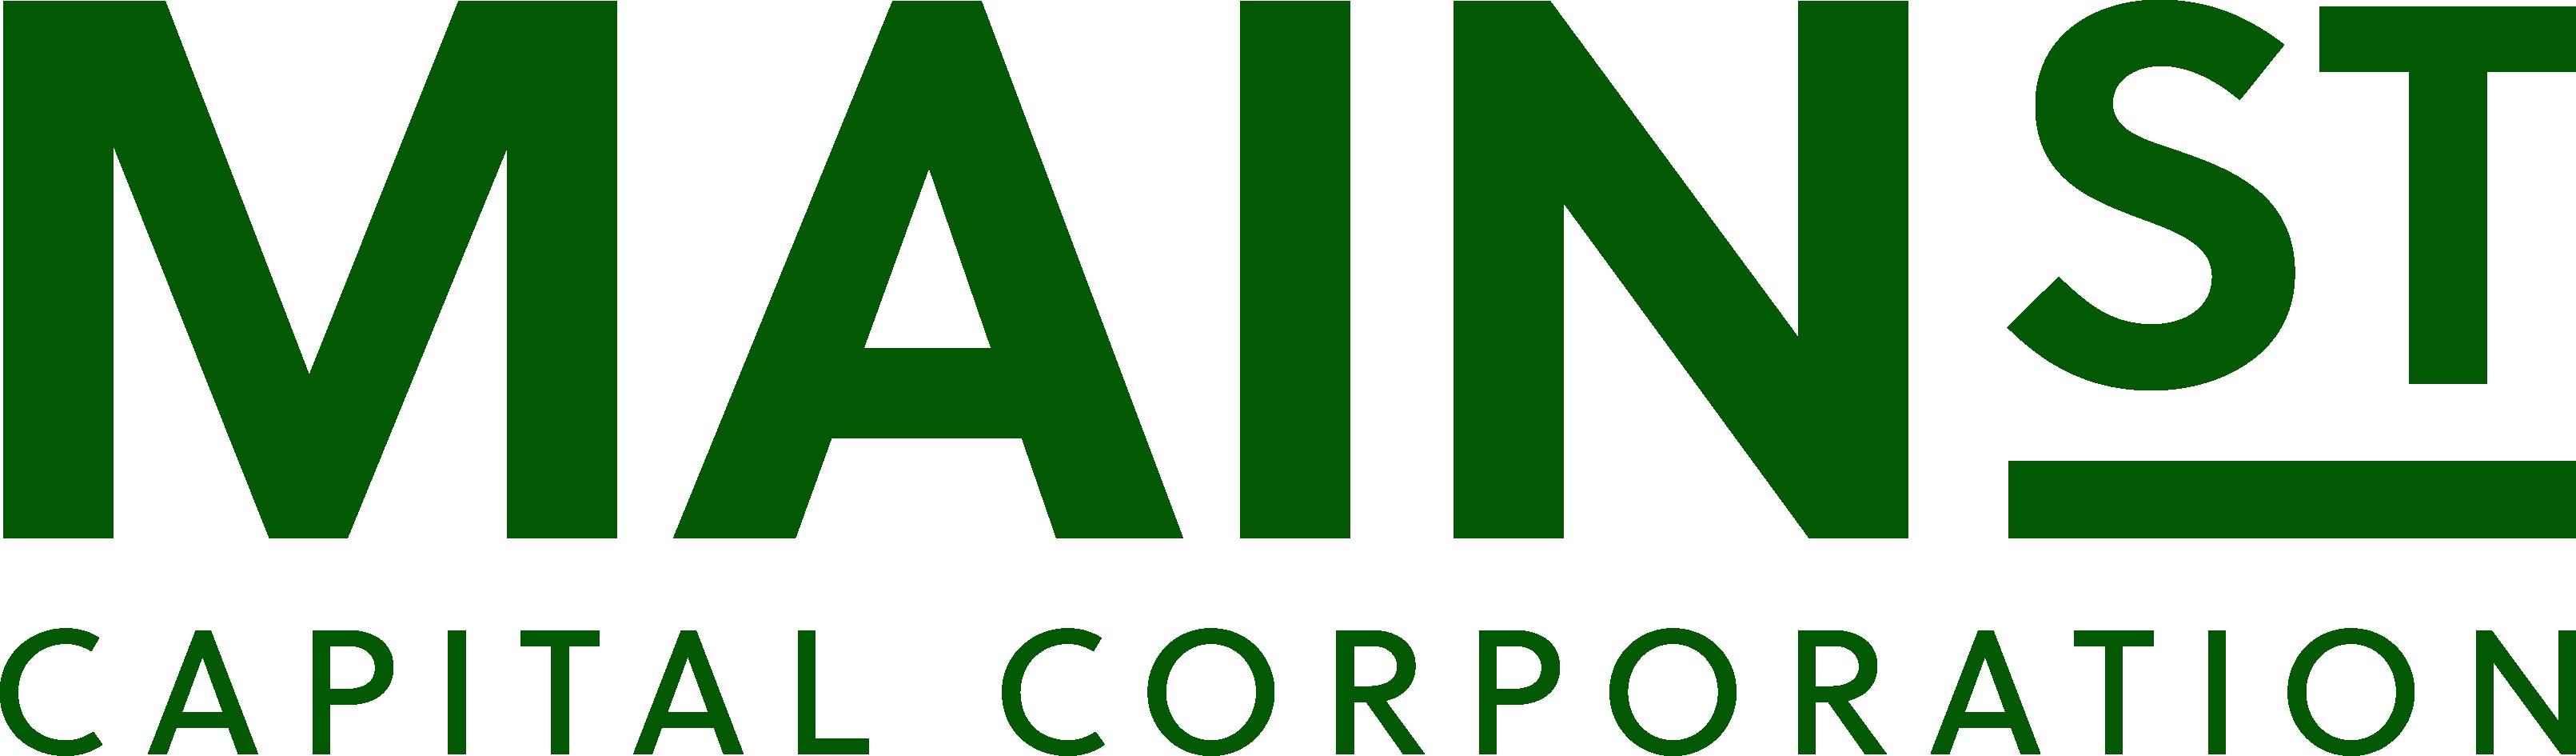 Videoanalyse - Logo von Main Street Capital